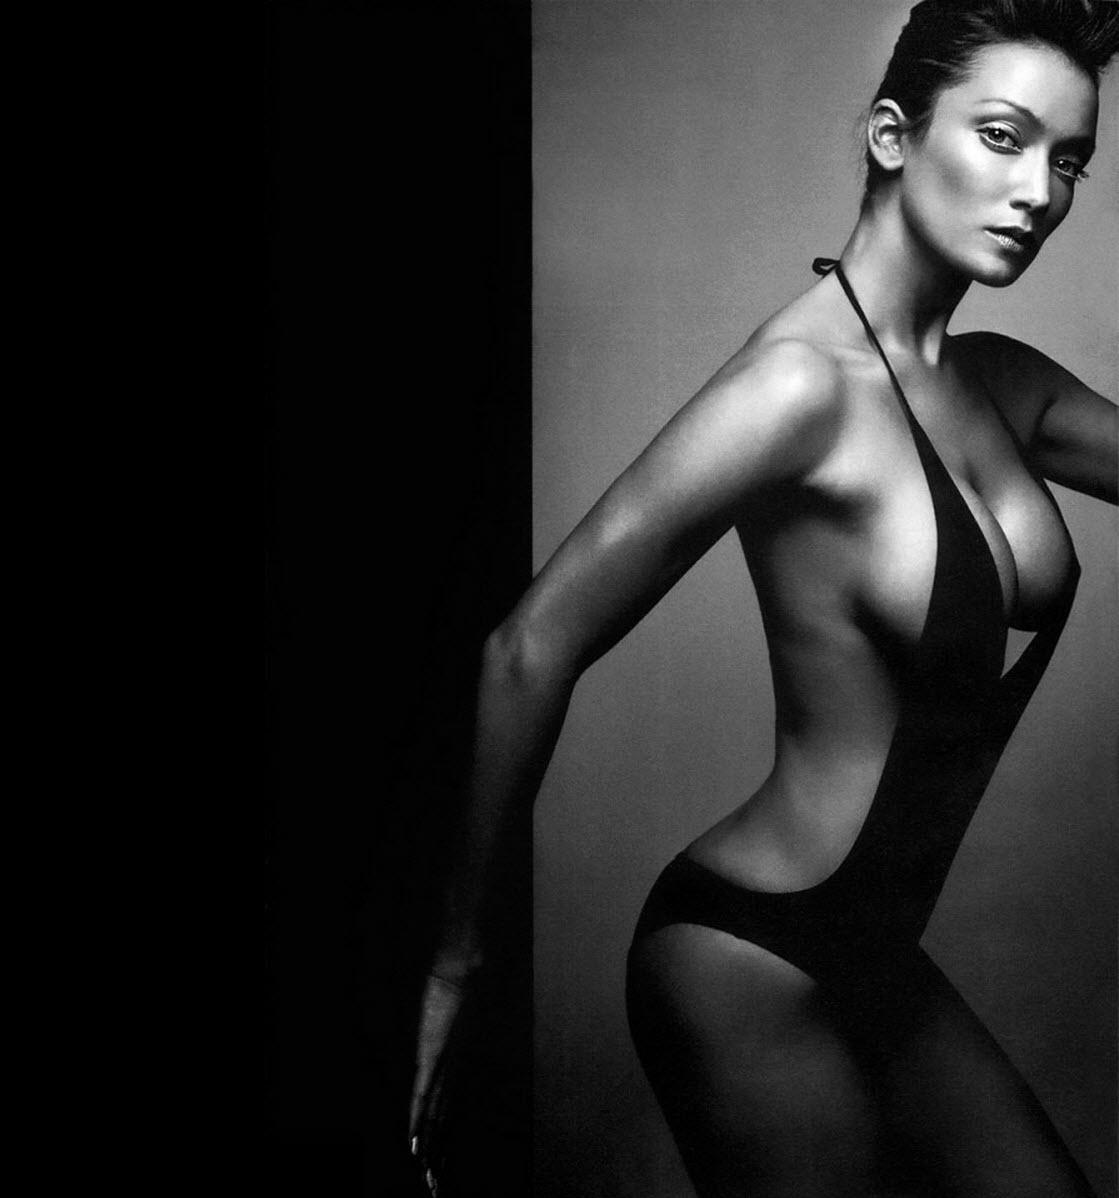 http://1.bp.blogspot.com/_oHxiR-yjcmo/TUC2k9uLrjI/AAAAAAAAKaQ/gxapDLCFCpw/s1600/Beautiful-Girls-in-Black-and-White-Wallpapers_02%2B%252889%2529.jpg